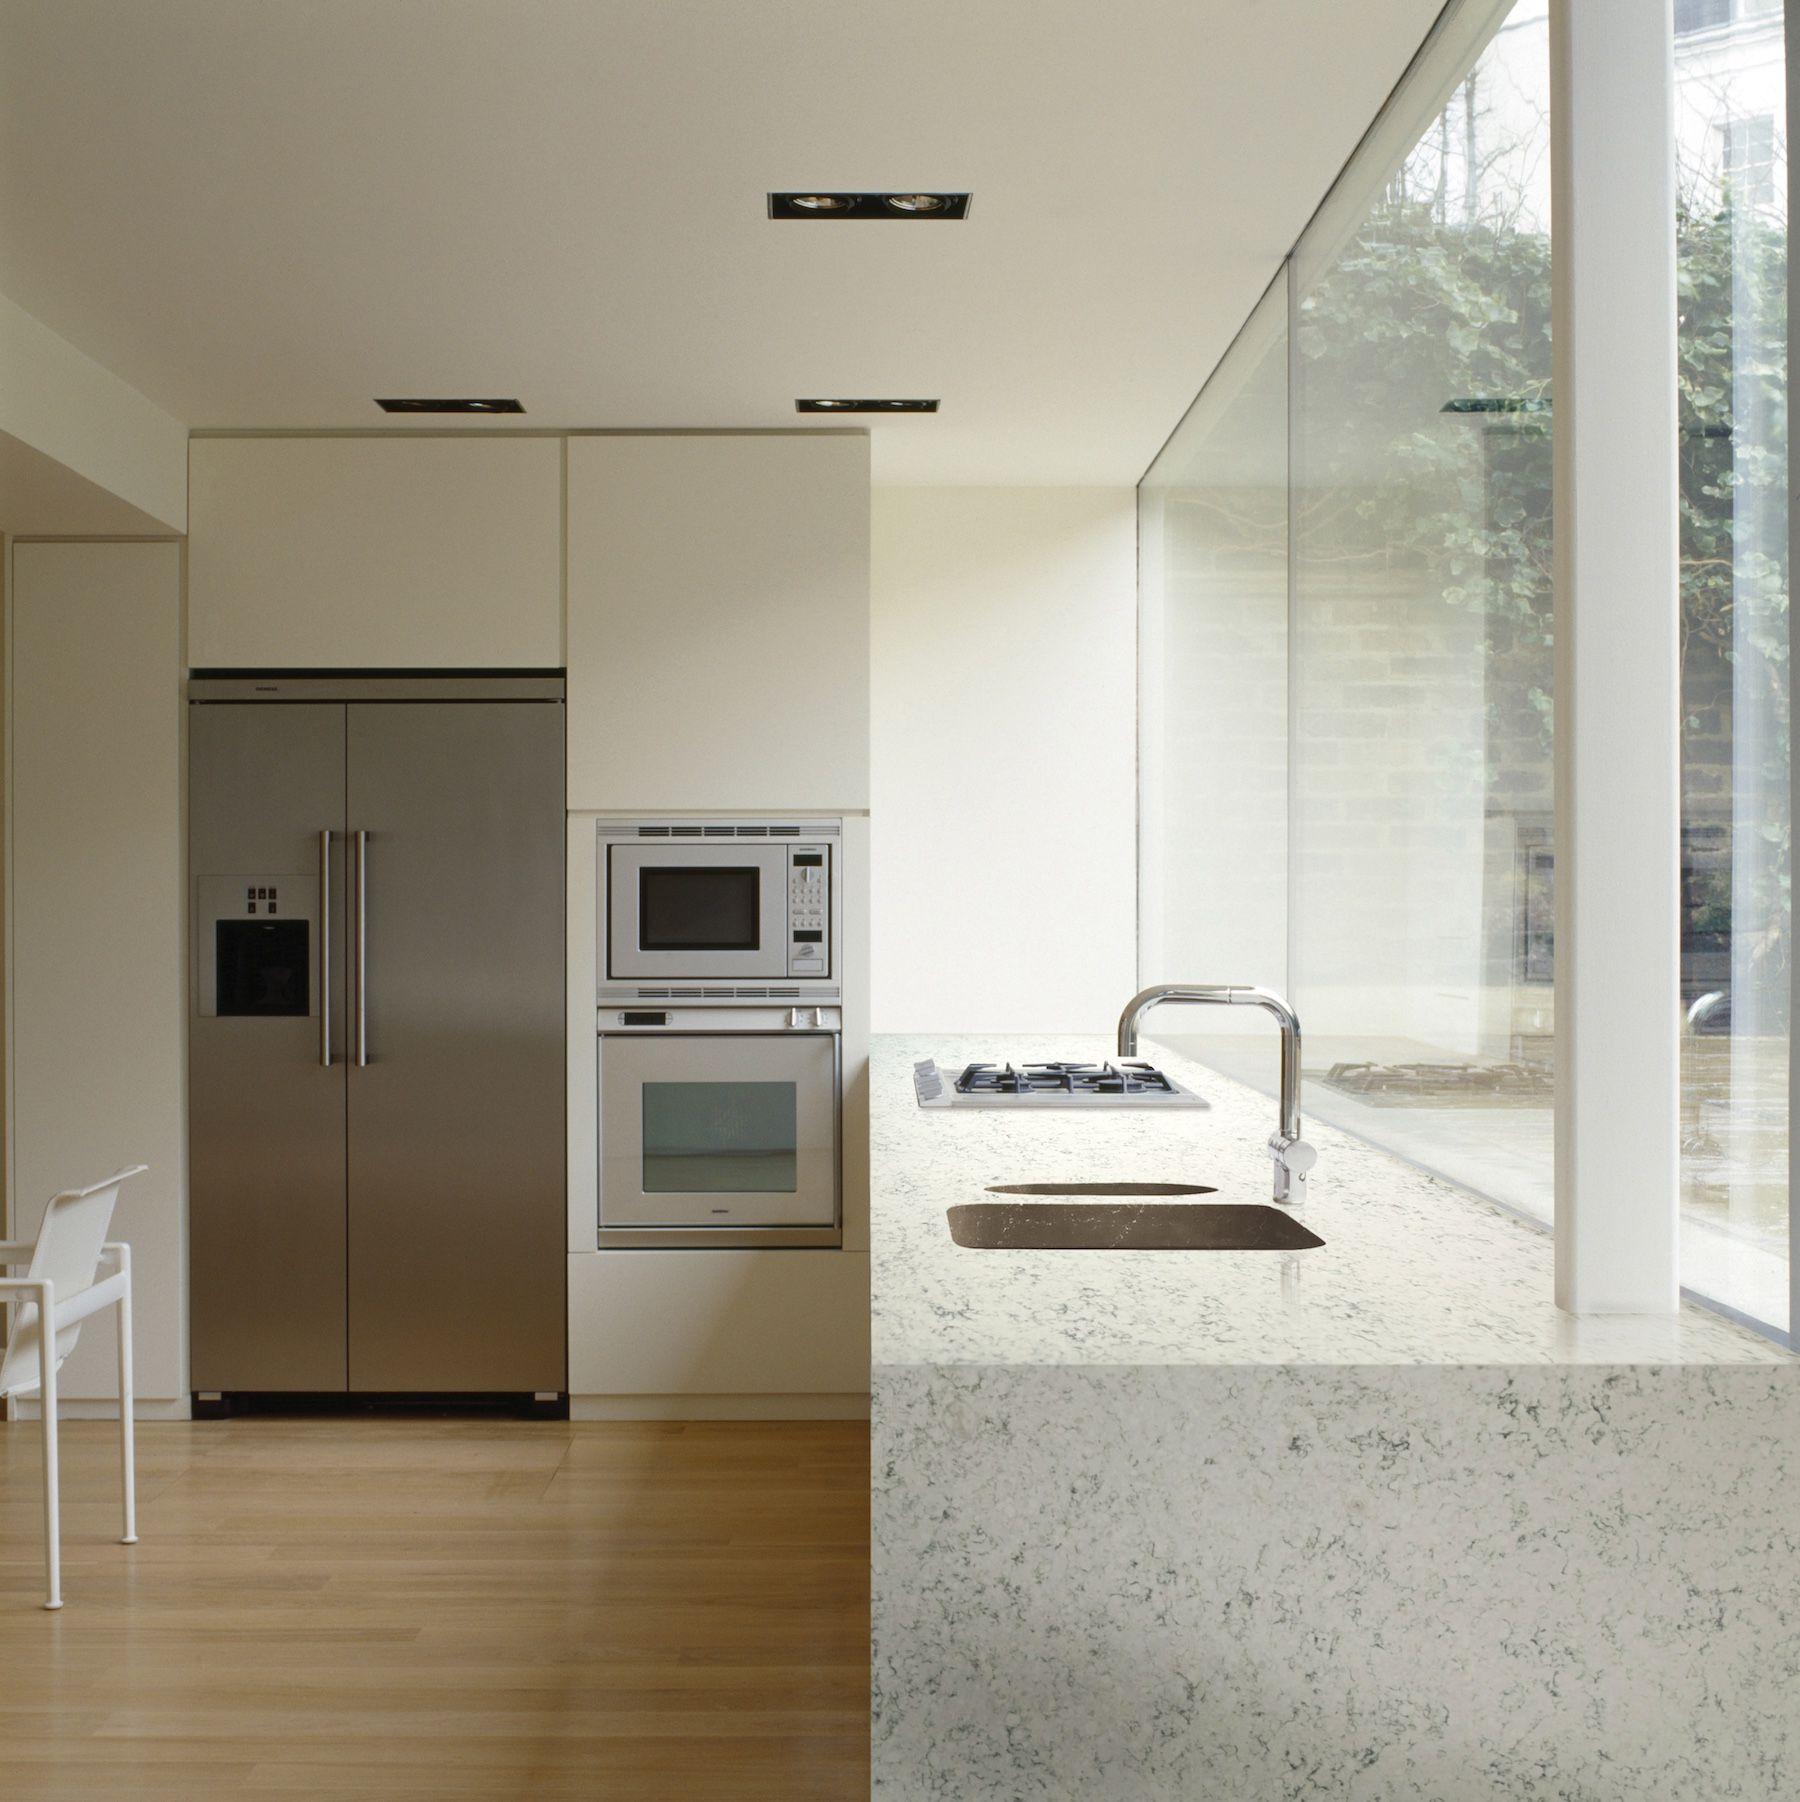 Hanstone Quartz Cascina Collection Italian Waves Ru701j Handleslifebeautifully Marble Kitchen Design Ideas Inspiration